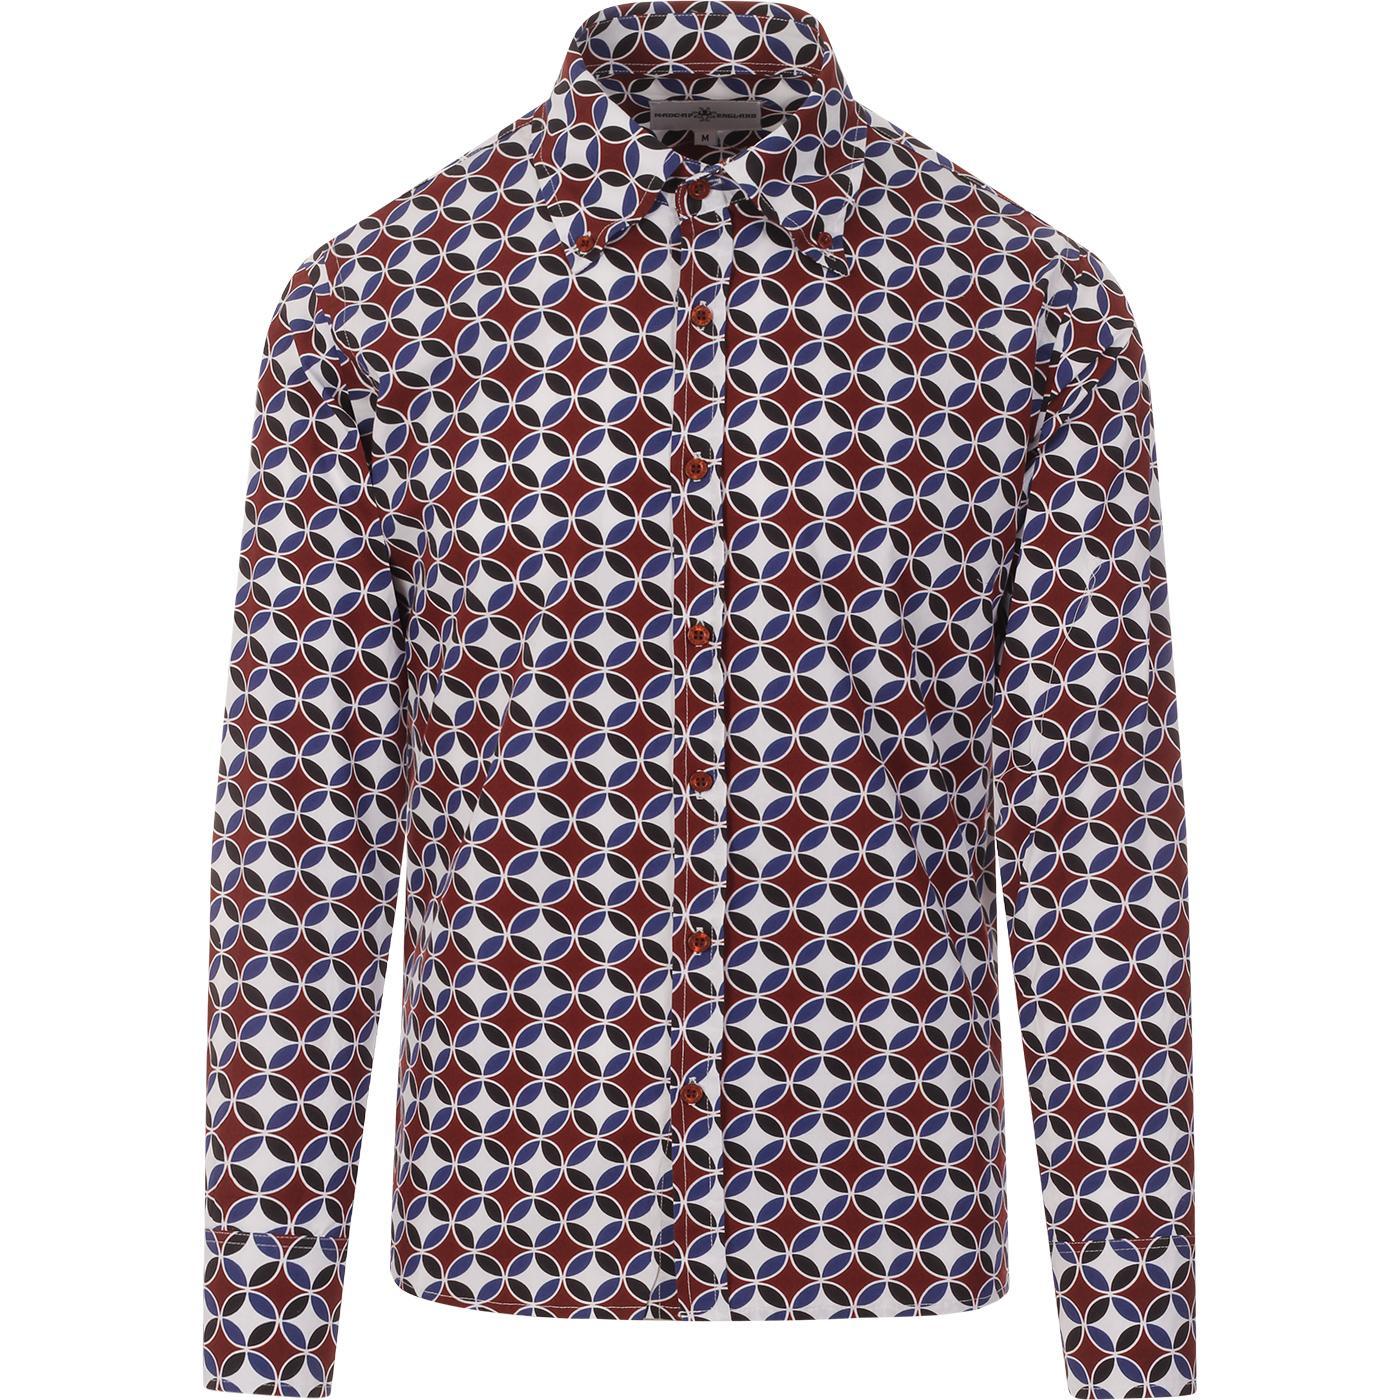 madcap england mens trip 60s circles print long sleeve shirt burgundy blue